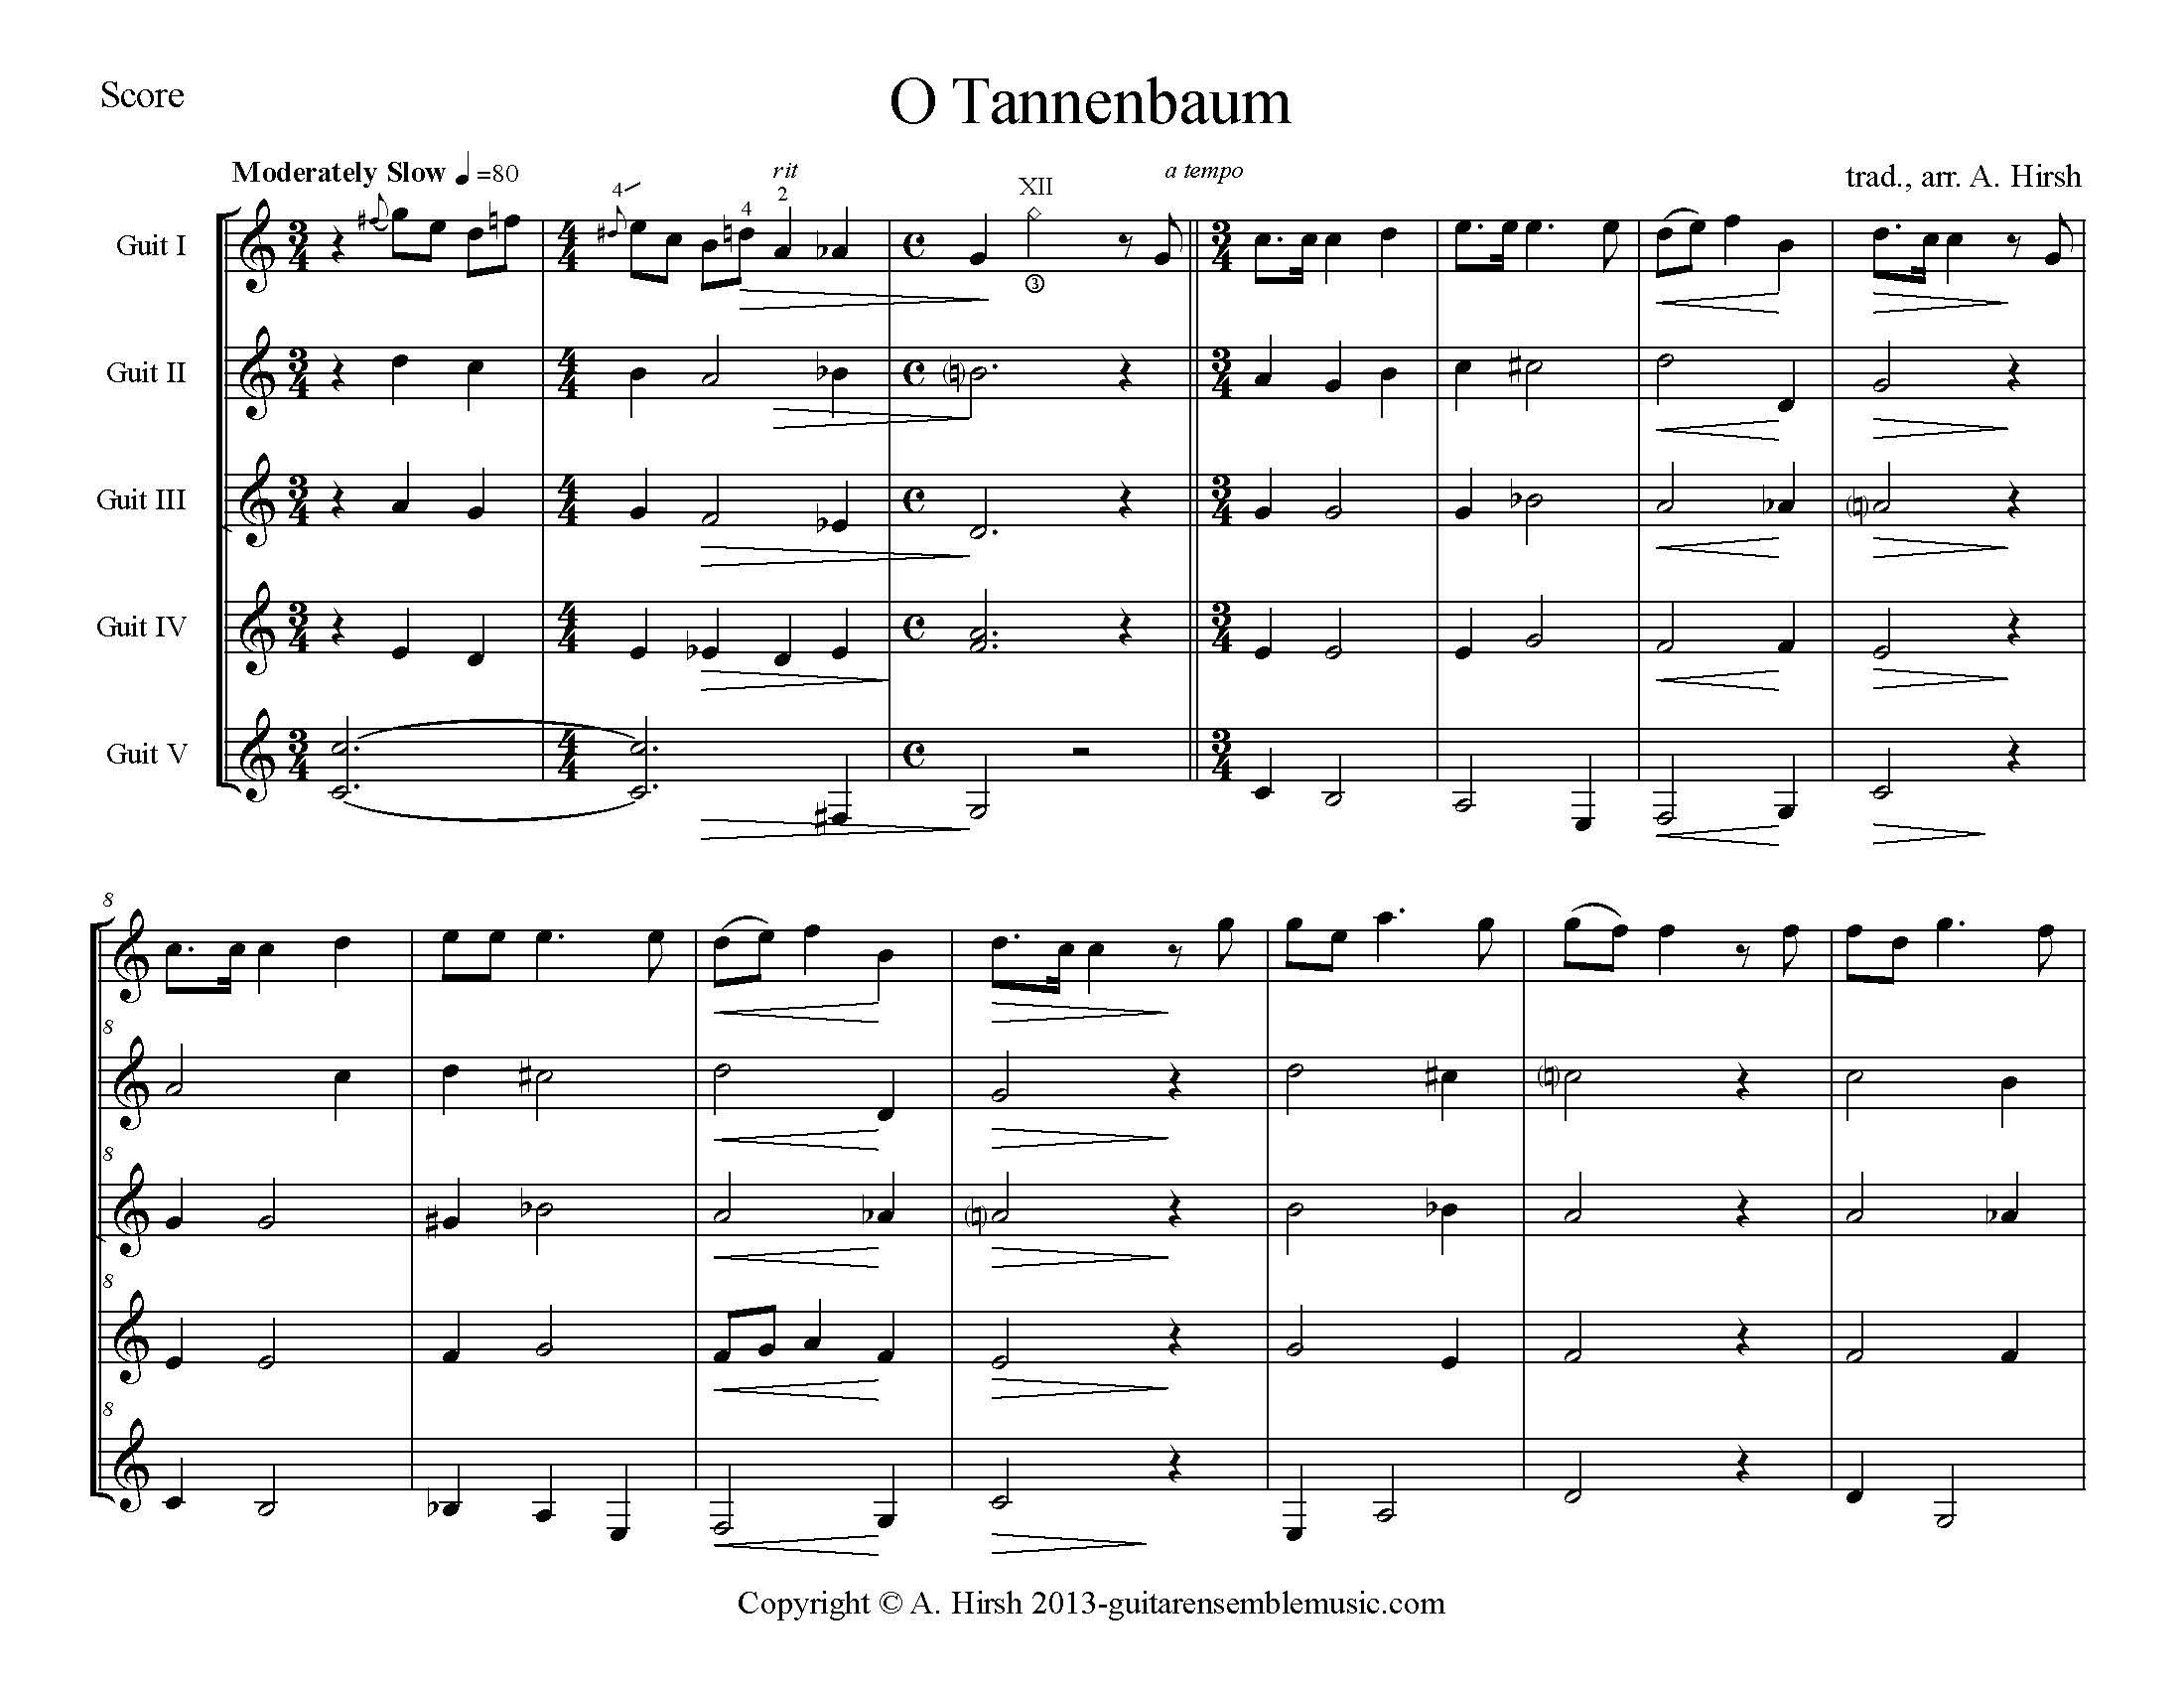 O Tannenbaum (O Christmas Tree) Jazz arr. Hirsh (E/M)